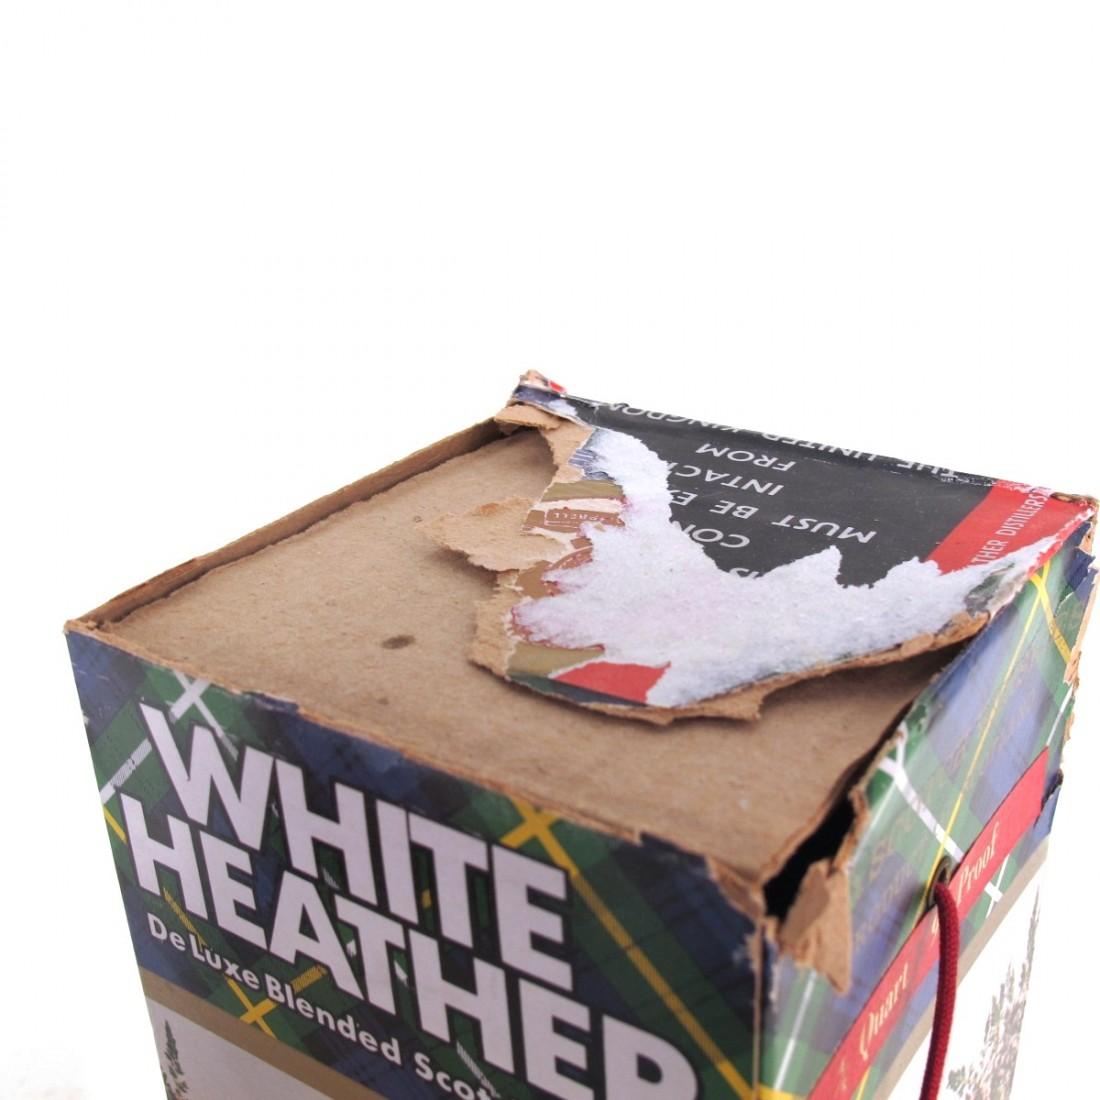 White Heather De Luxe 1960s